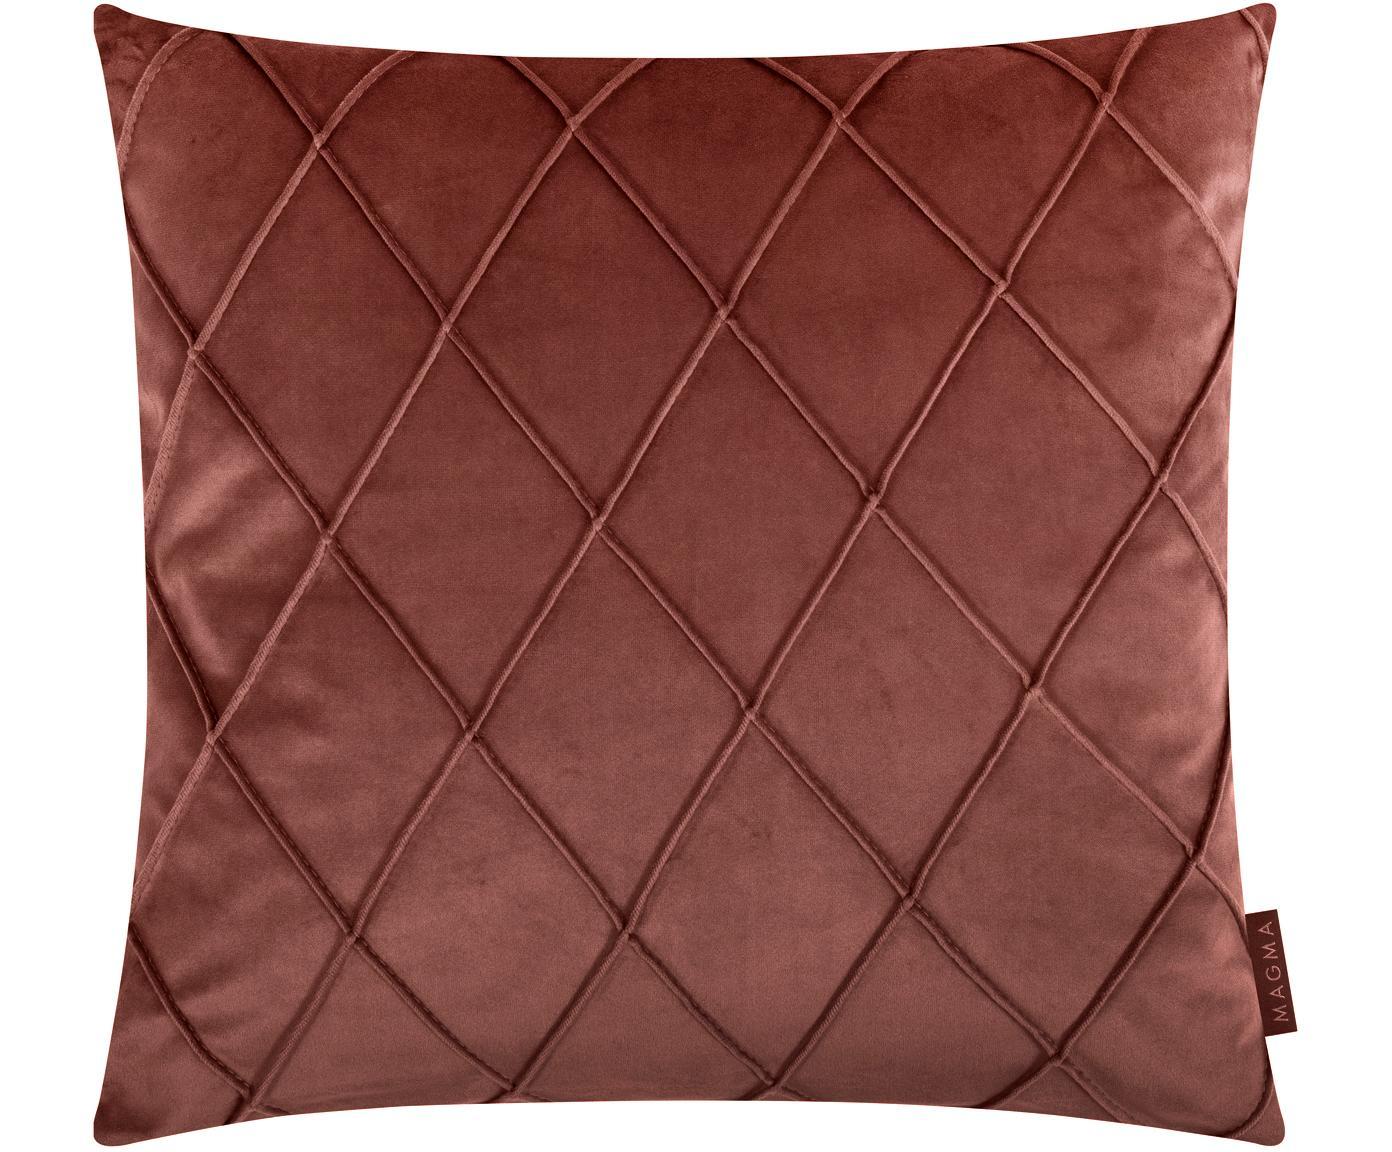 Samt-Kissenhülle Nobless mit erhabenem Rautenmuster, 100% Polyestersamt, Terrakottarot, 50 x 50 cm